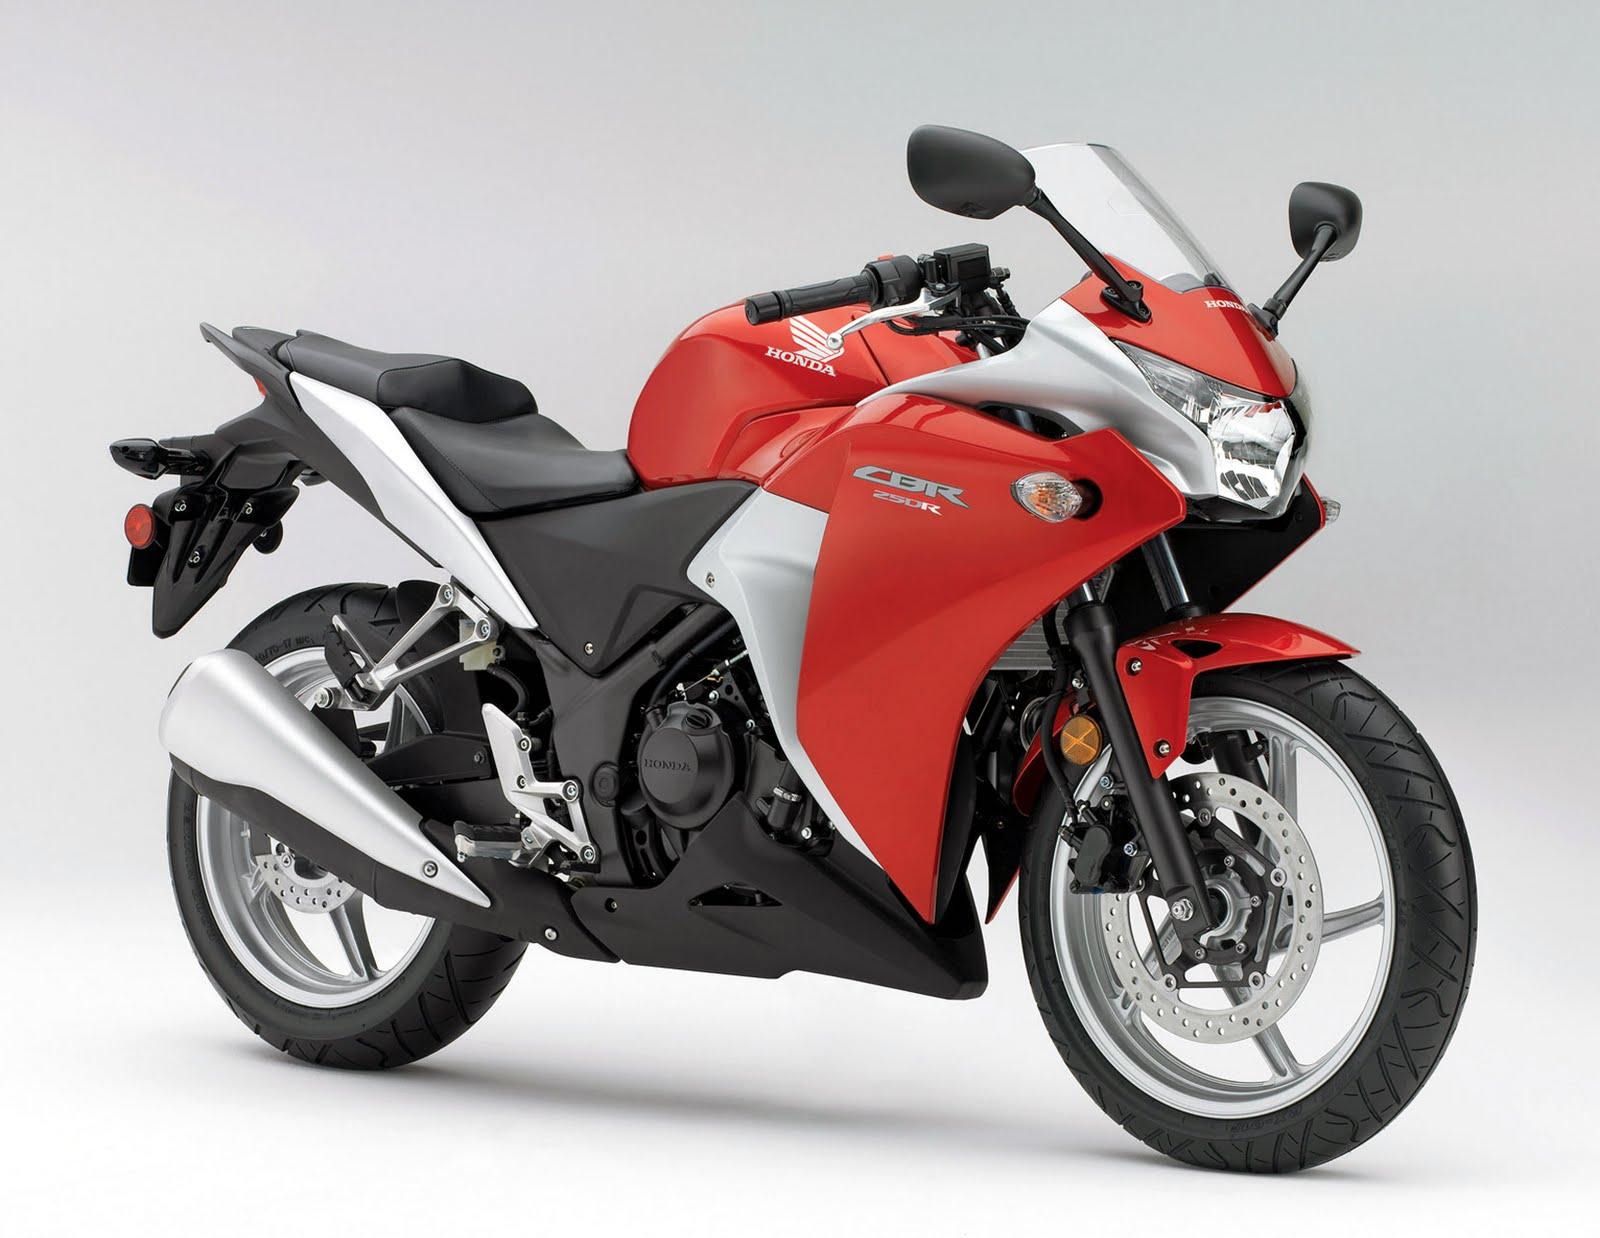 superbike 250 in malaysia wak story sharing info